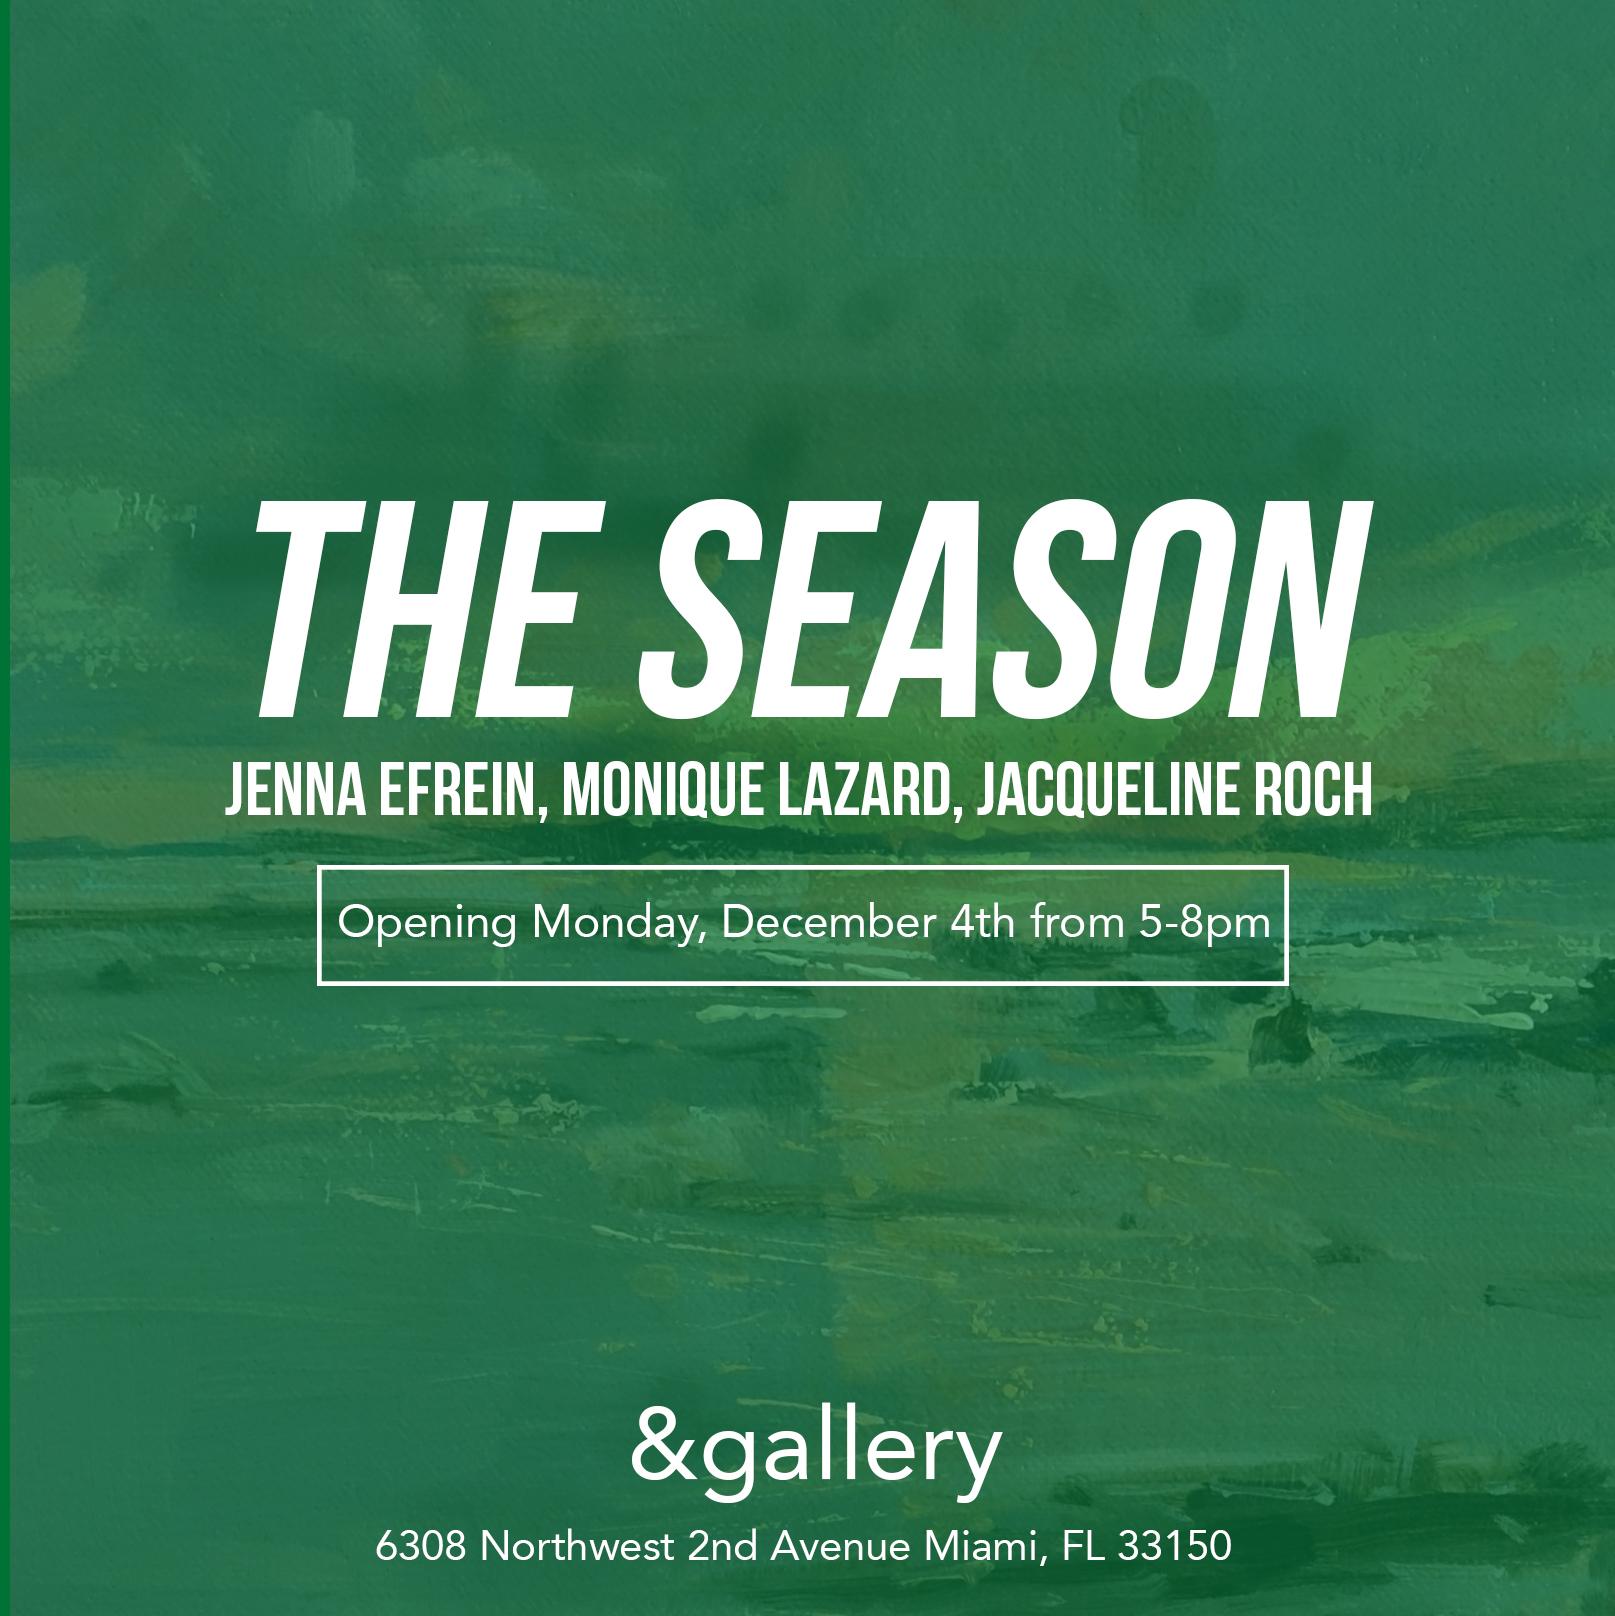 The-Season-opening-date-Square.jpg